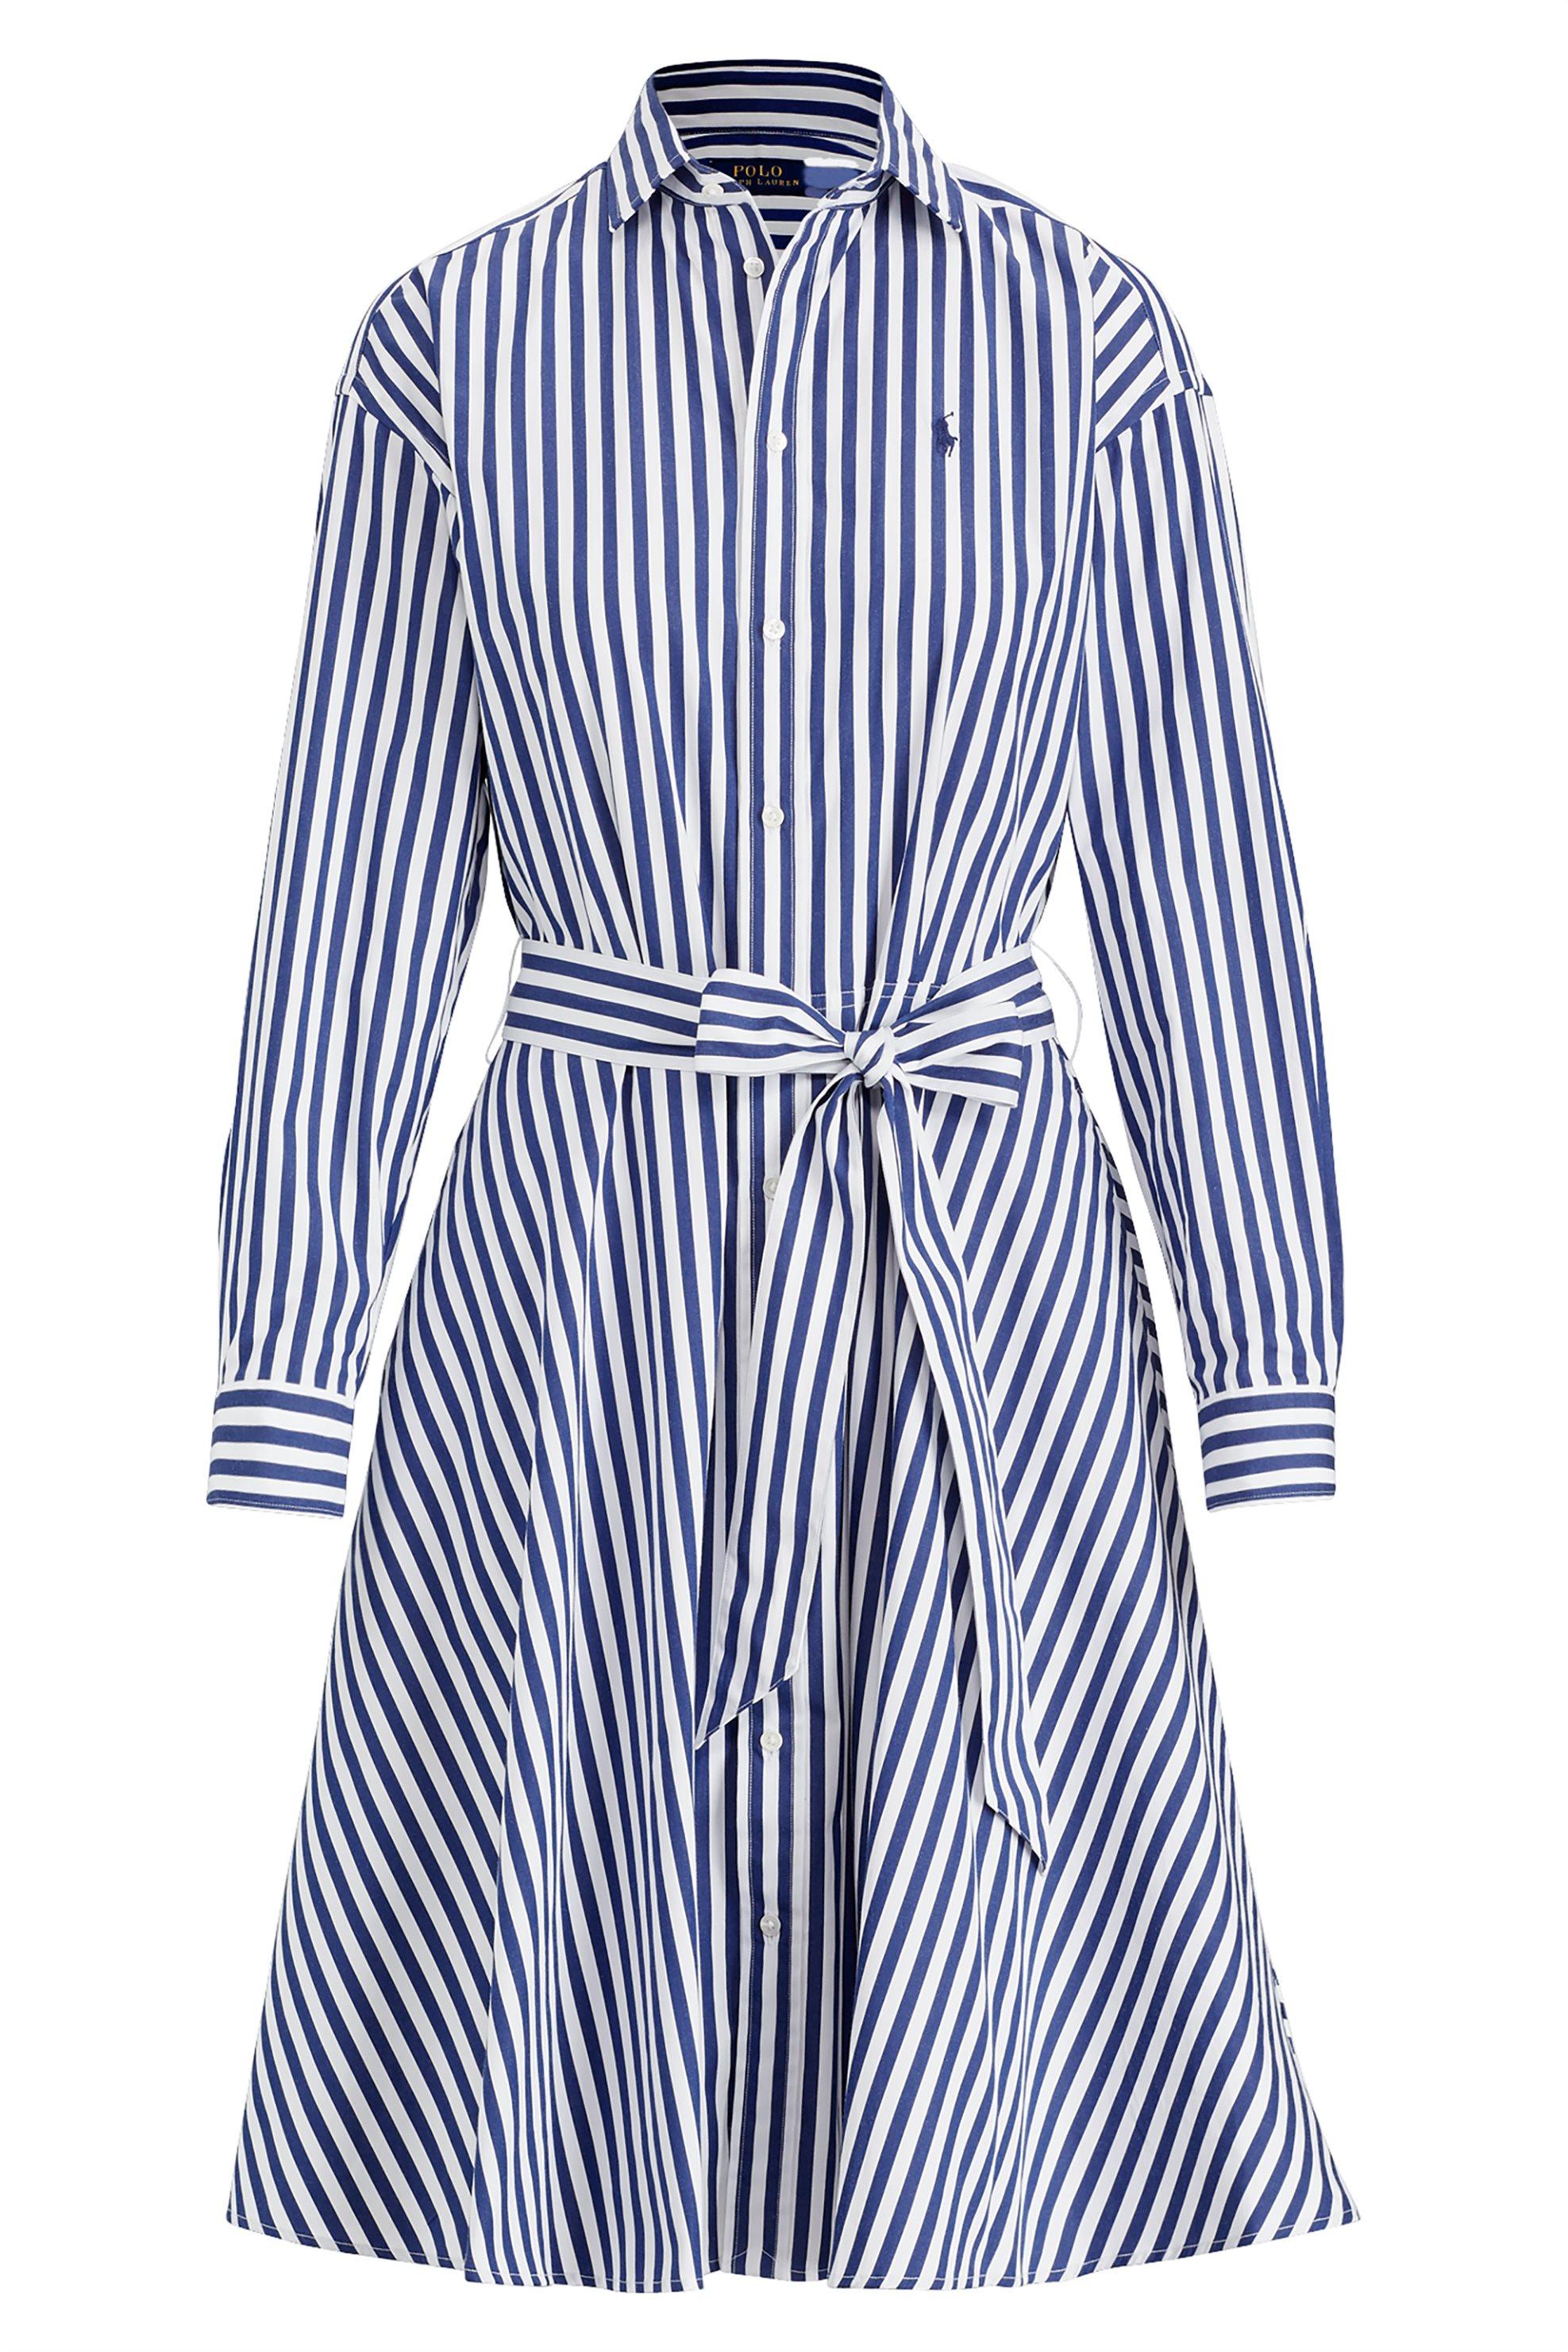 Polo Ralph Lauren γυναικείο ριγέ φόρεμα Cotton Broadcloth - 211733672001 - Μπλε  γυναικα   ρουχα   φορέματα   midi φορέματα